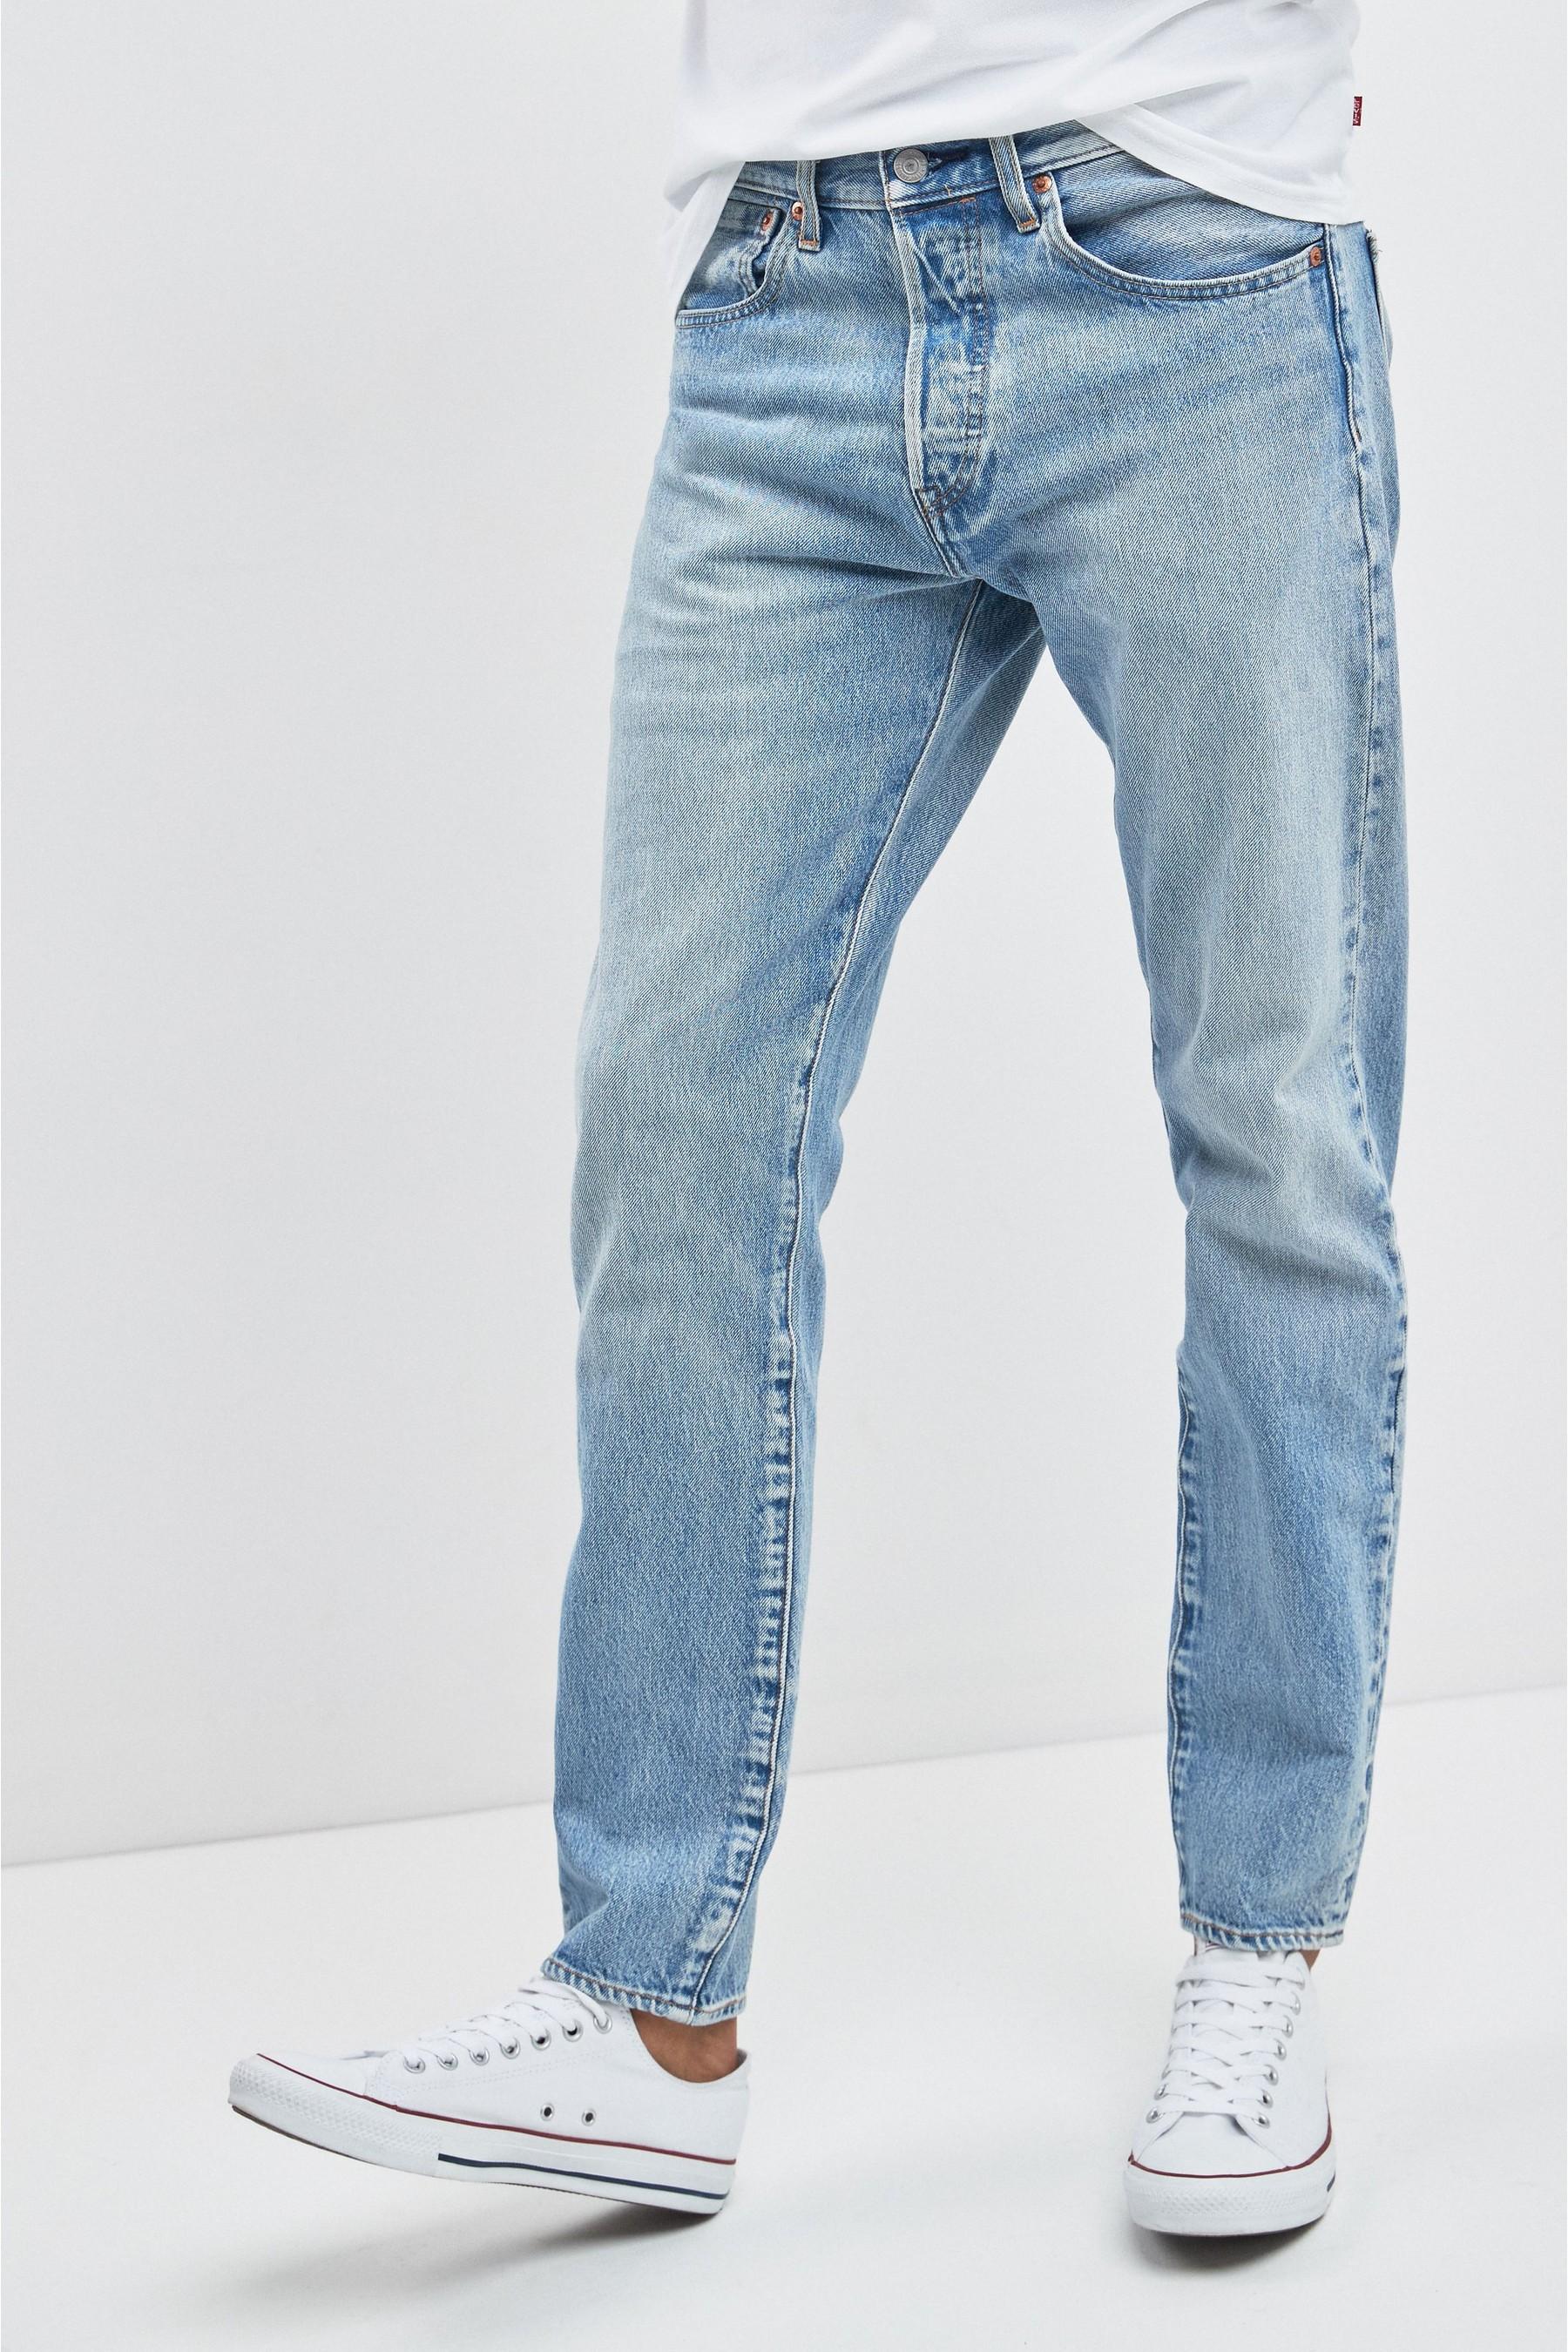 Mens Levi S 501 Slim Taper Jean Blue Jeans Outfit Men Denim Jeans Men Tapered Jeans Men